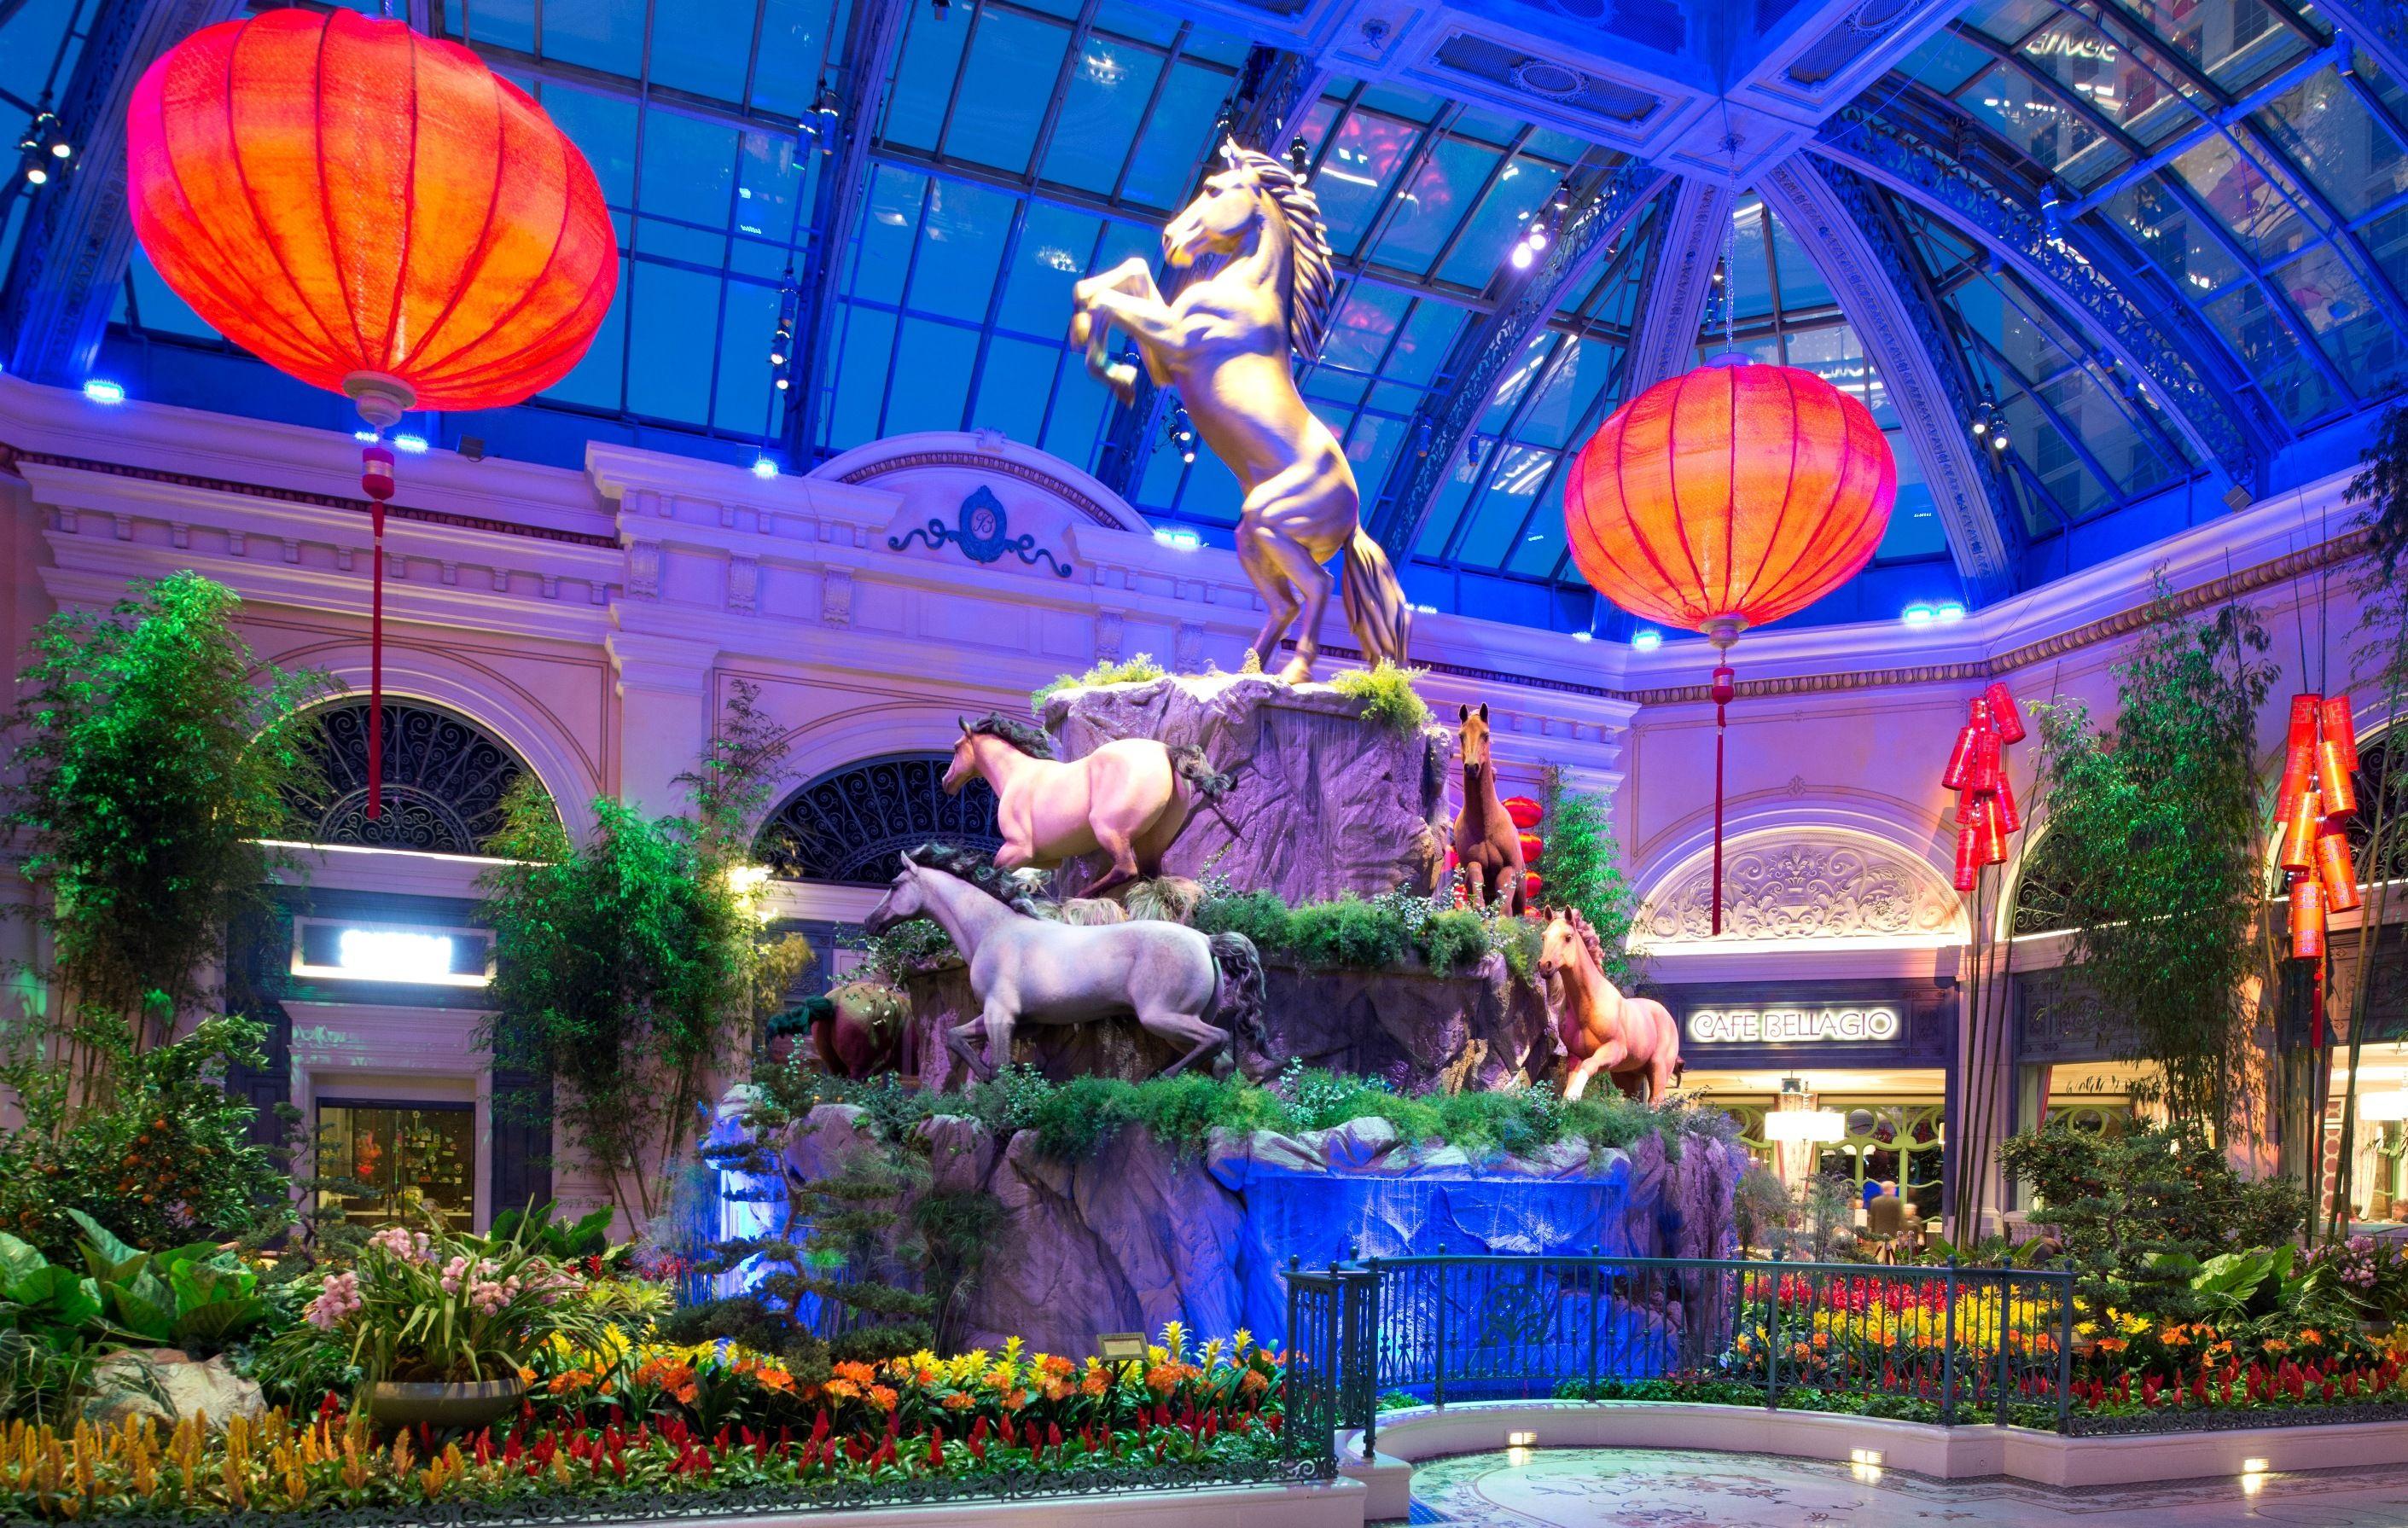 fa8d2ddc5c90595dfd2eb985f09e91d3 - Bellagio Conservatory & Botanical Gardens Las Vegas